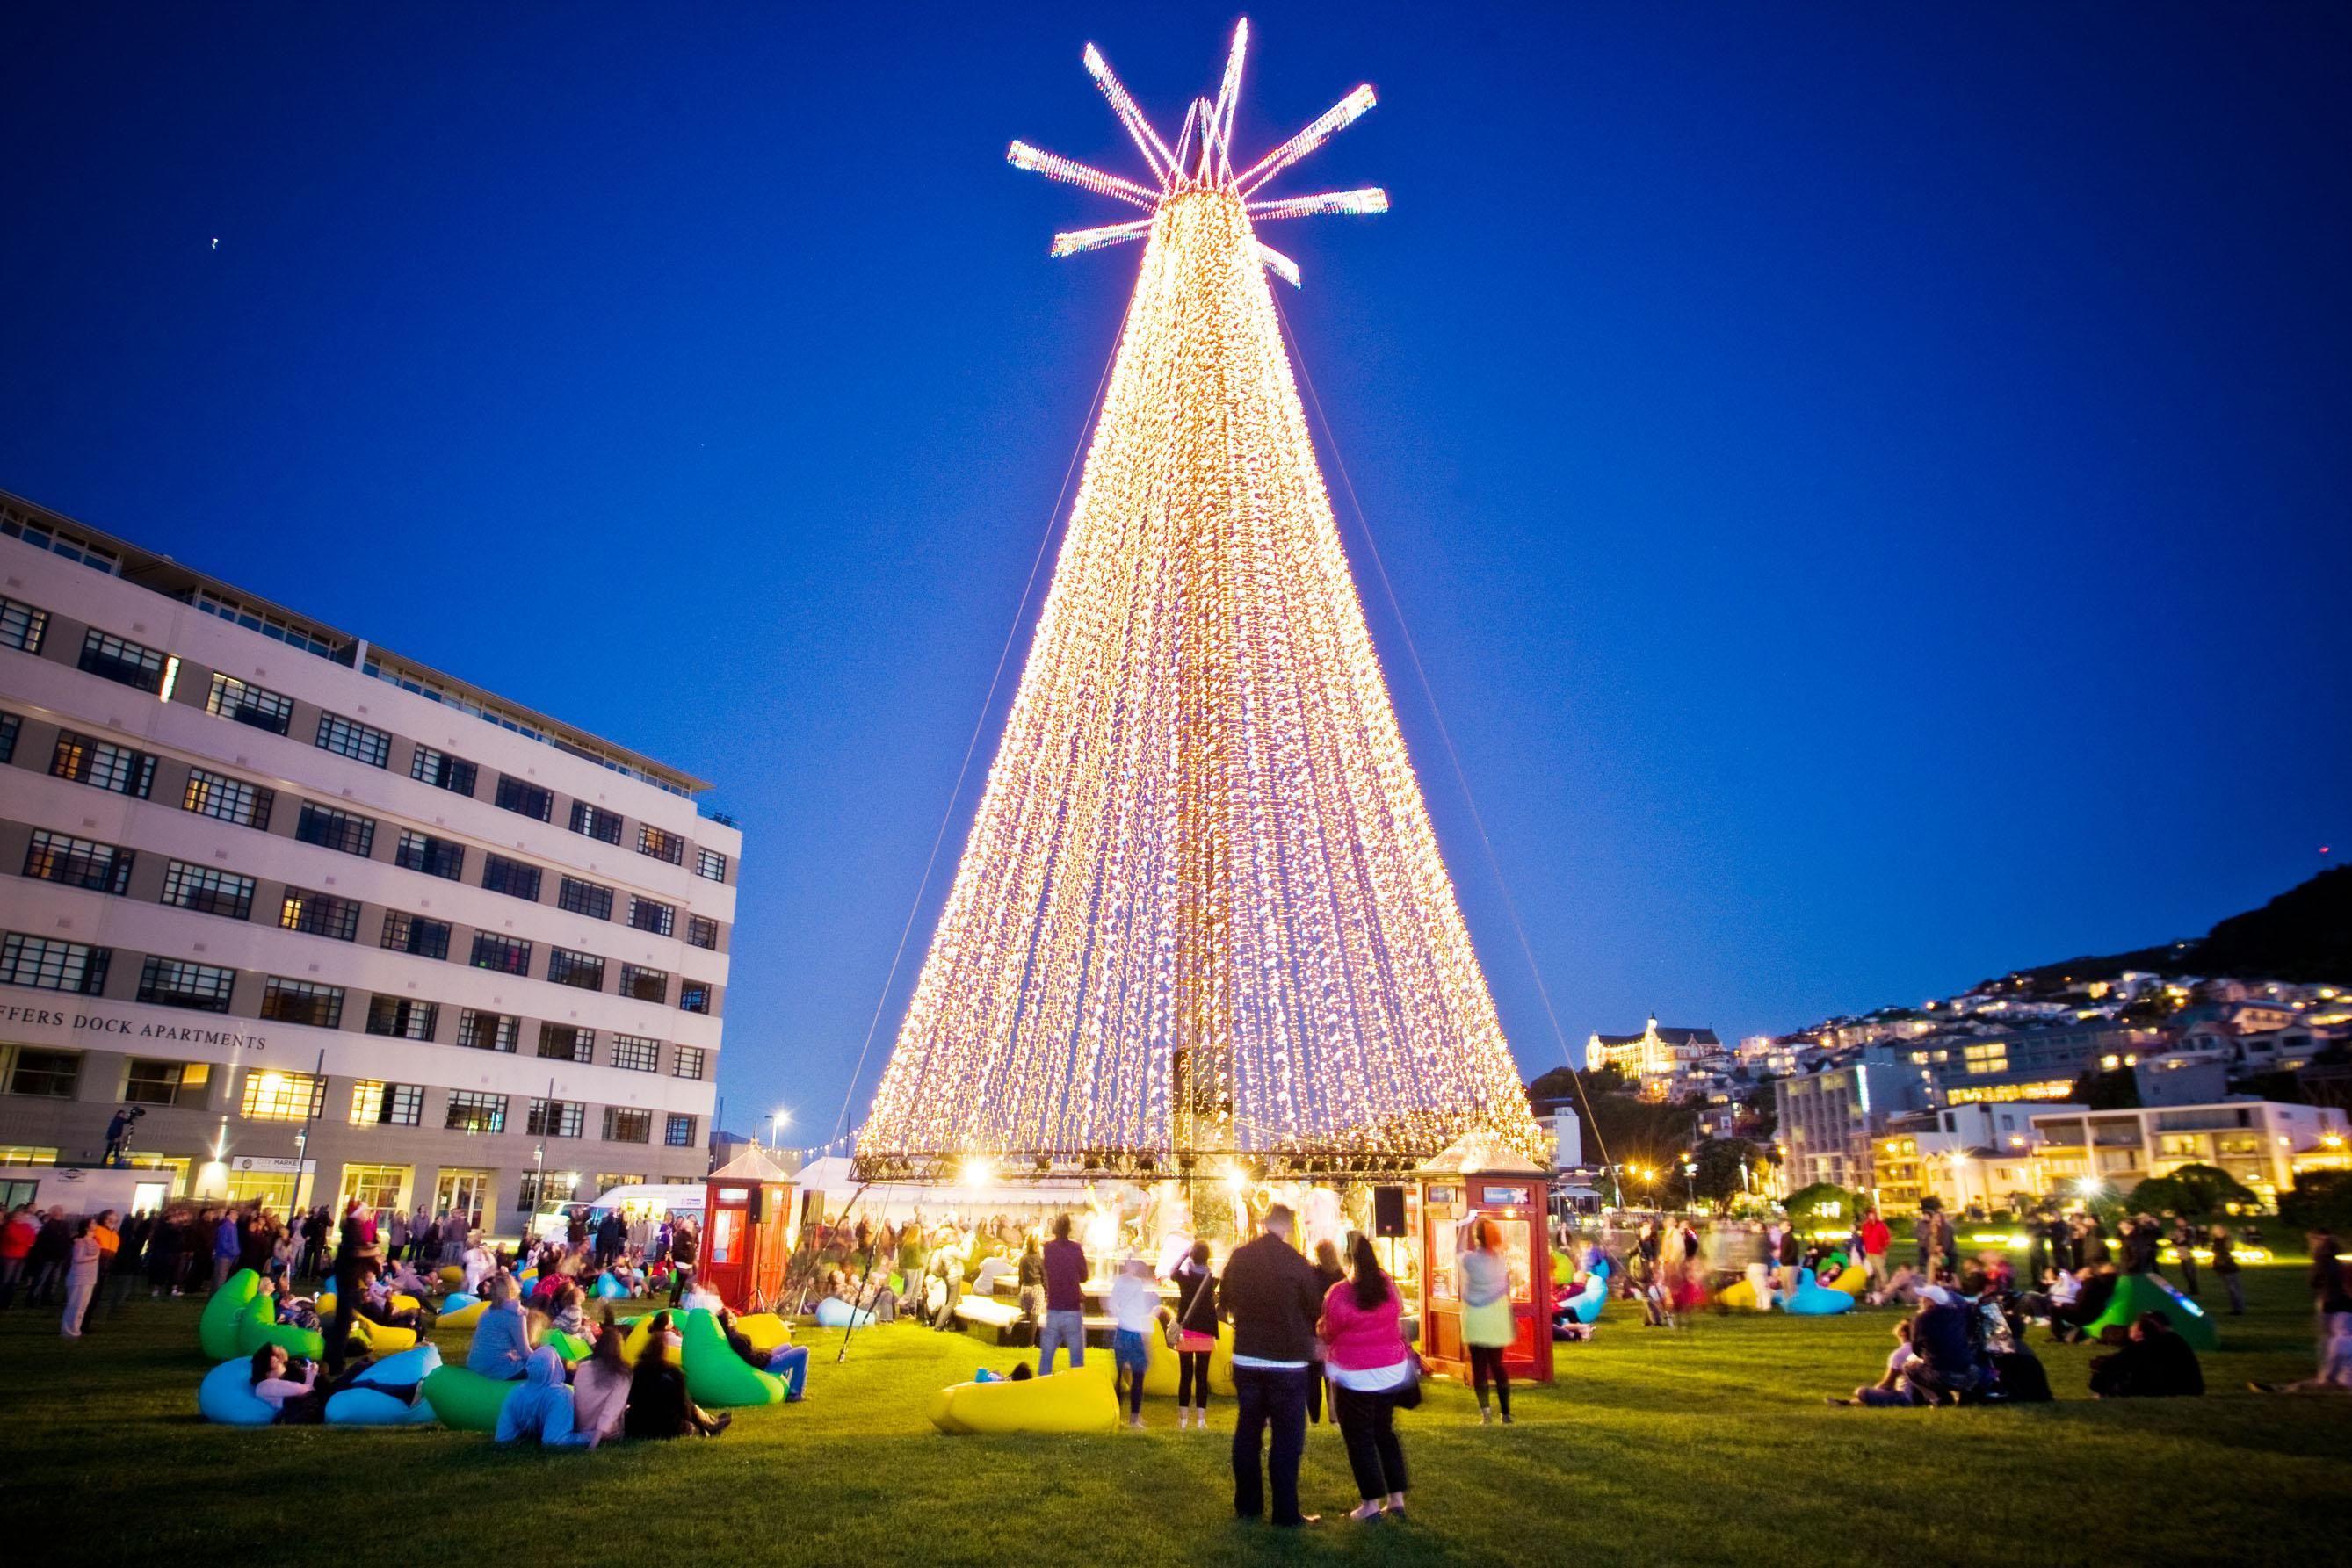 The Telecom Tree In Waitangi Park Wellington New Zealand Christmas In Australia Christmas Tree Light Up Christmas In Italy